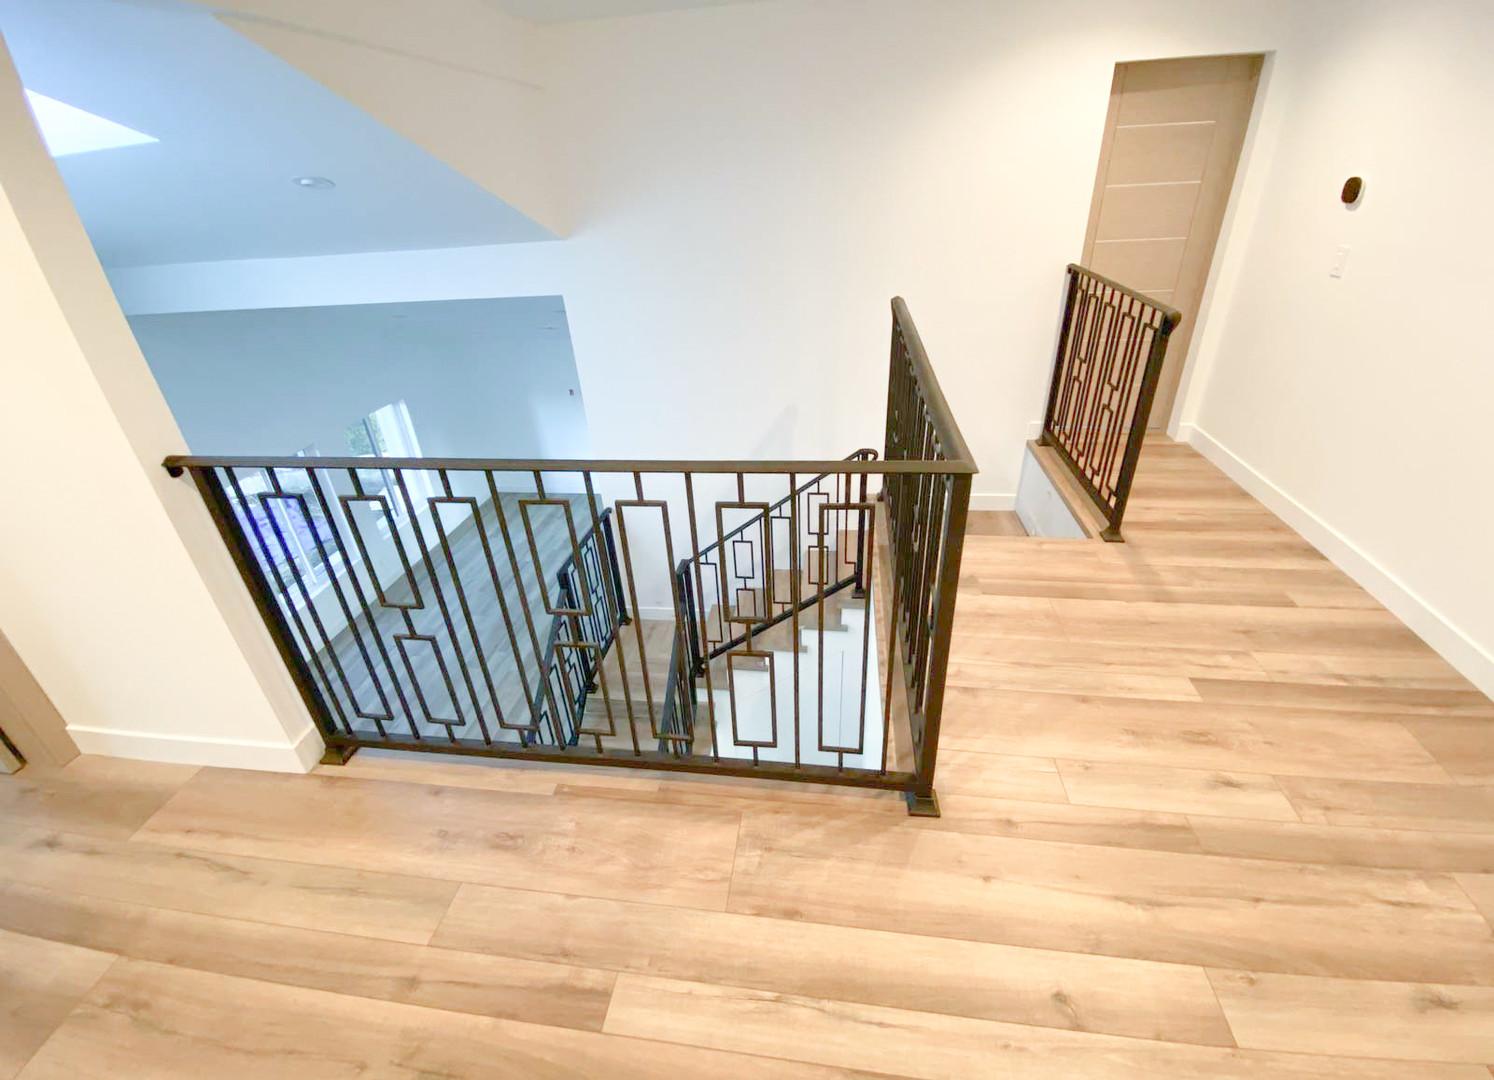 floors-and-railings1.jpg